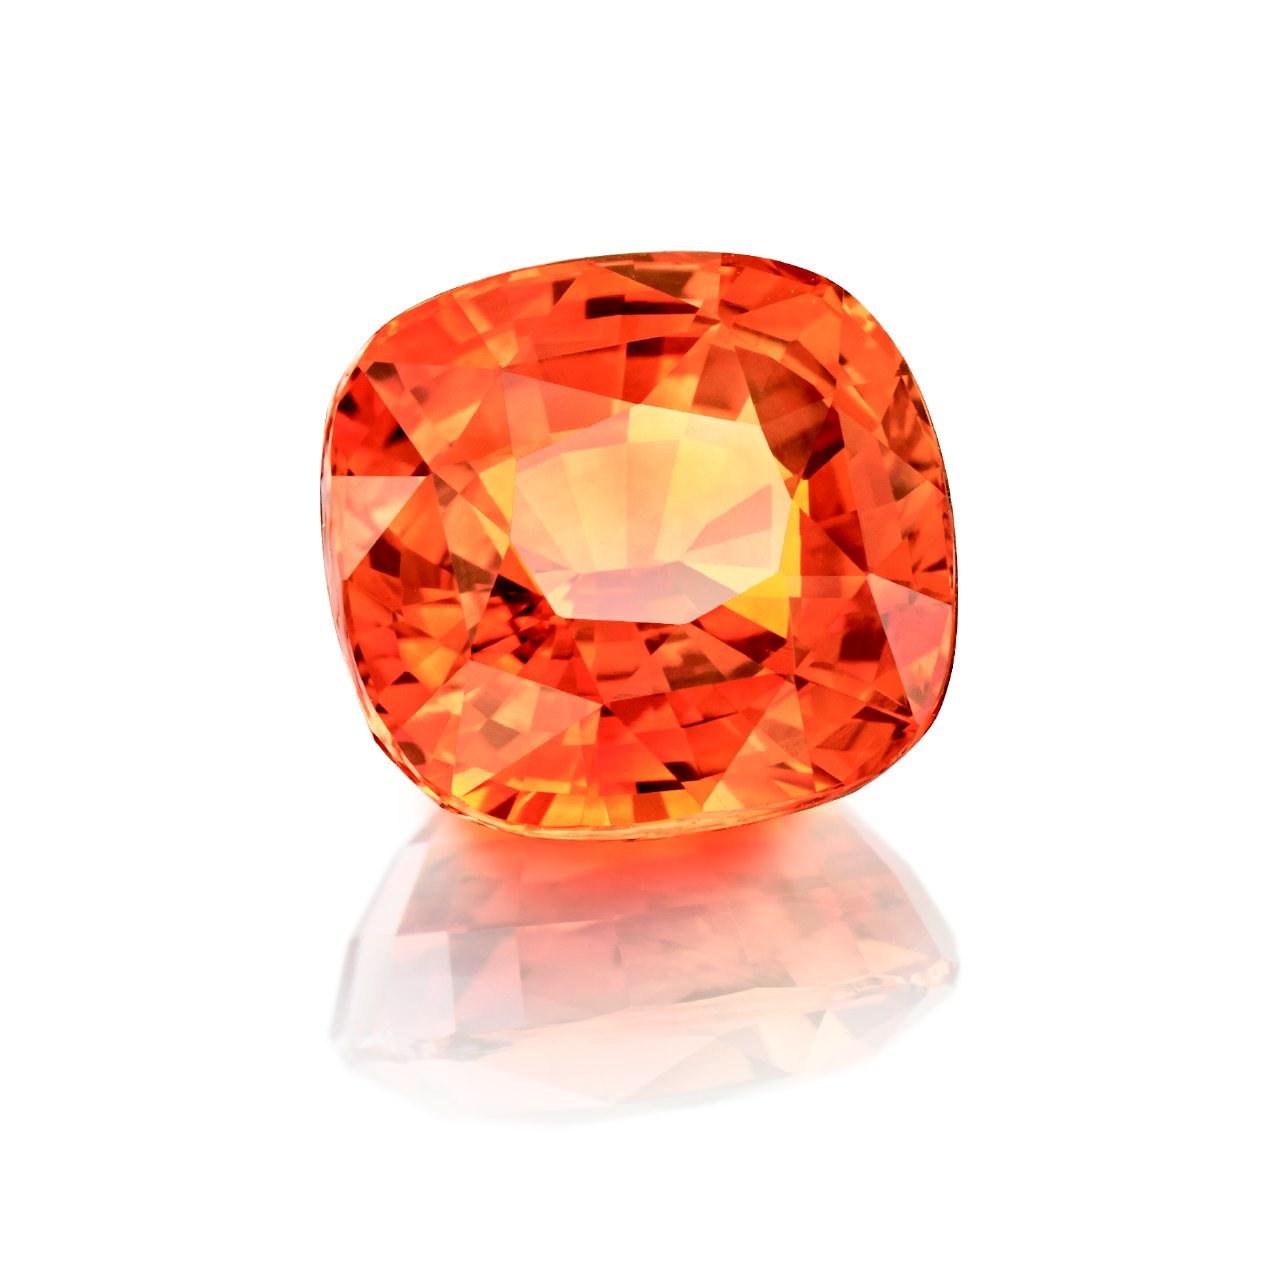 05. Constantin Wild - Saphir orange PRINT-cmyk